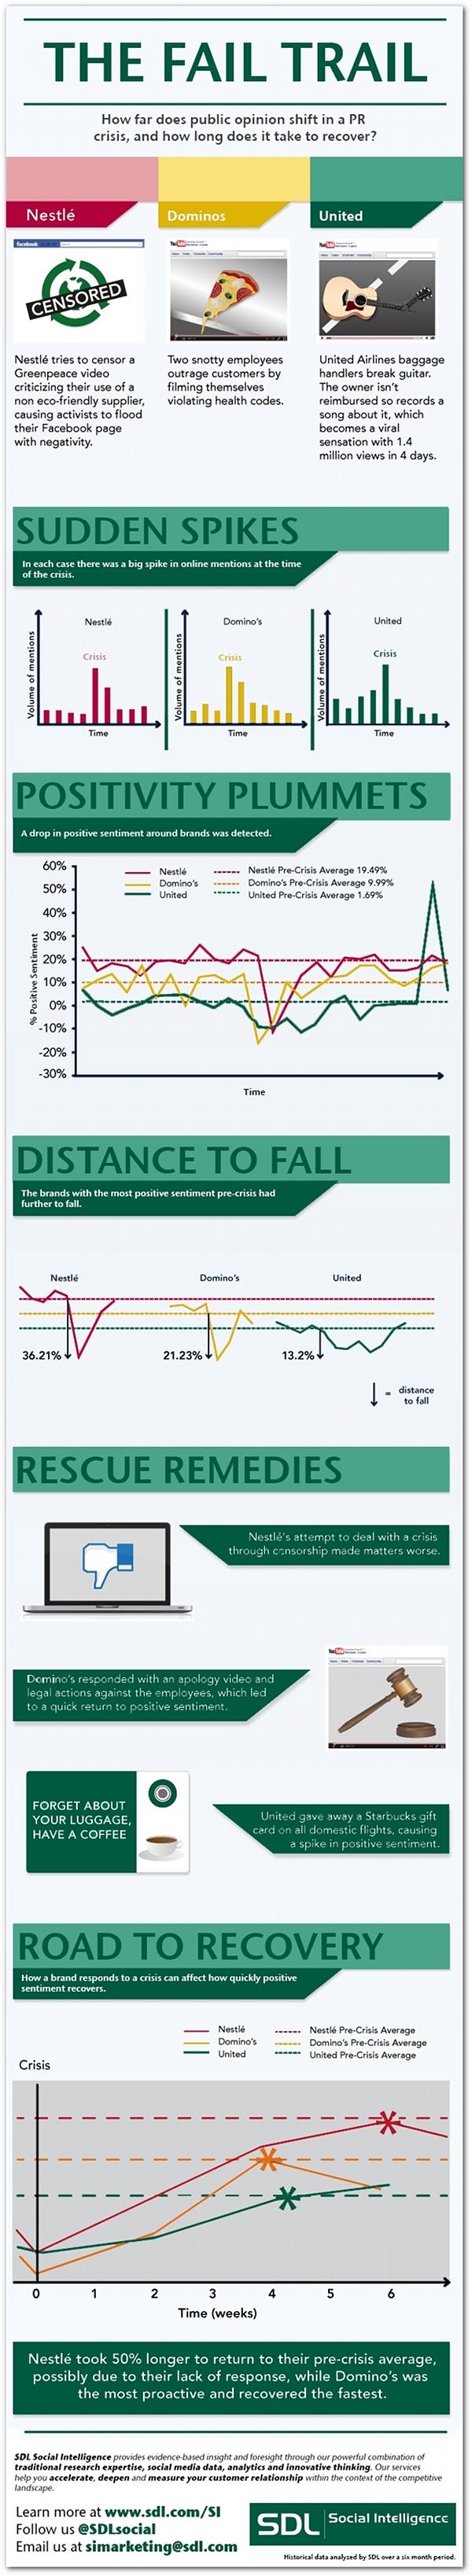 PR crisis infographic